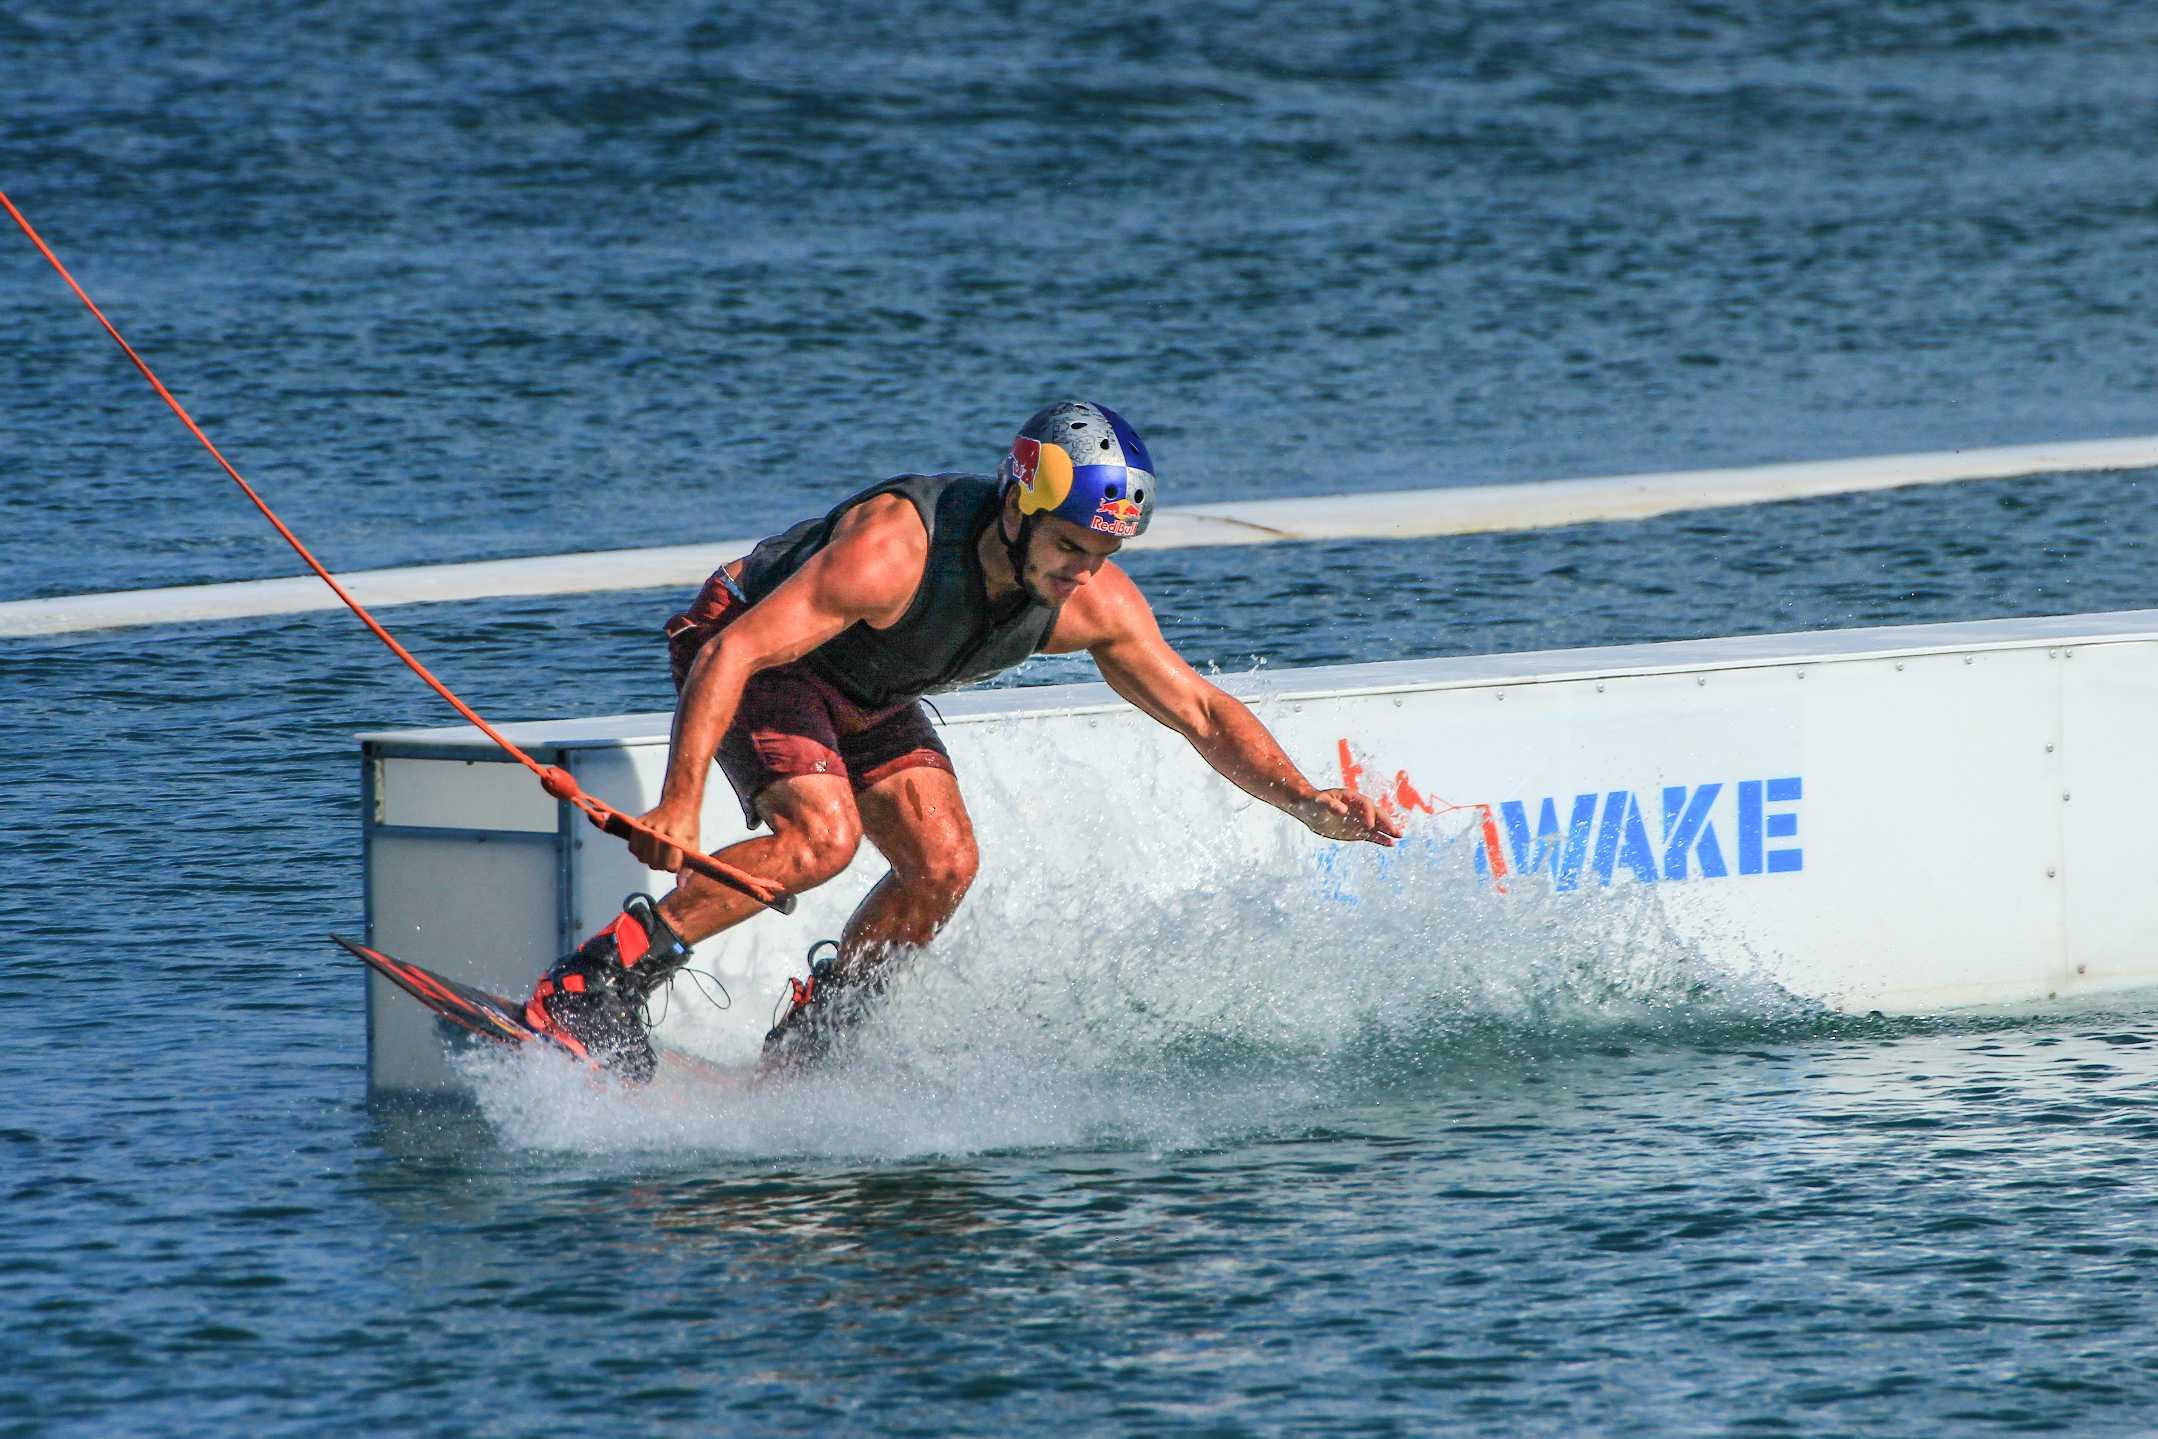 Wakeboard verseny 2018 - LupaWake